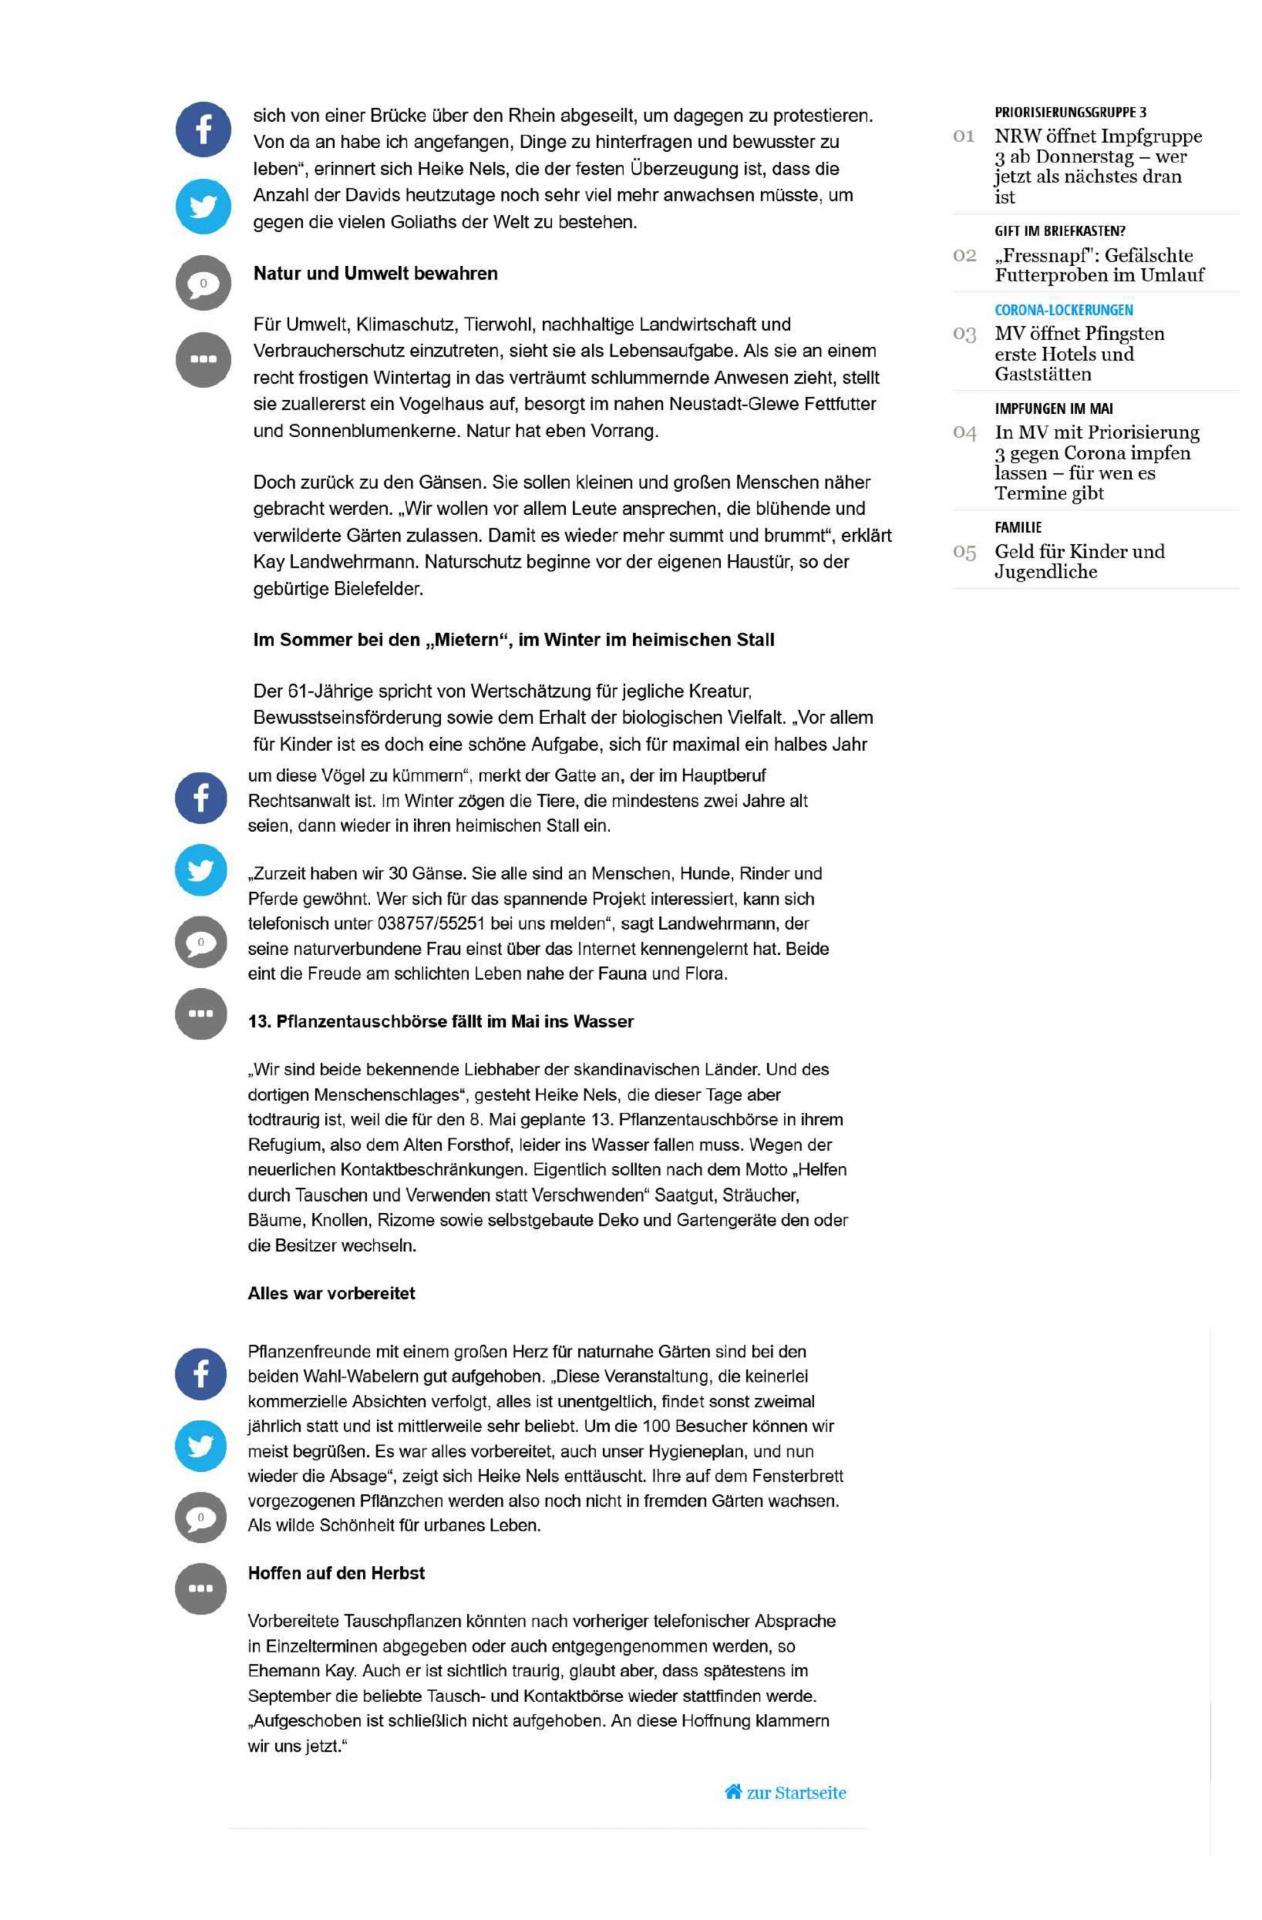 SVZ - Bericht vom 06.05.2021 (S 02)